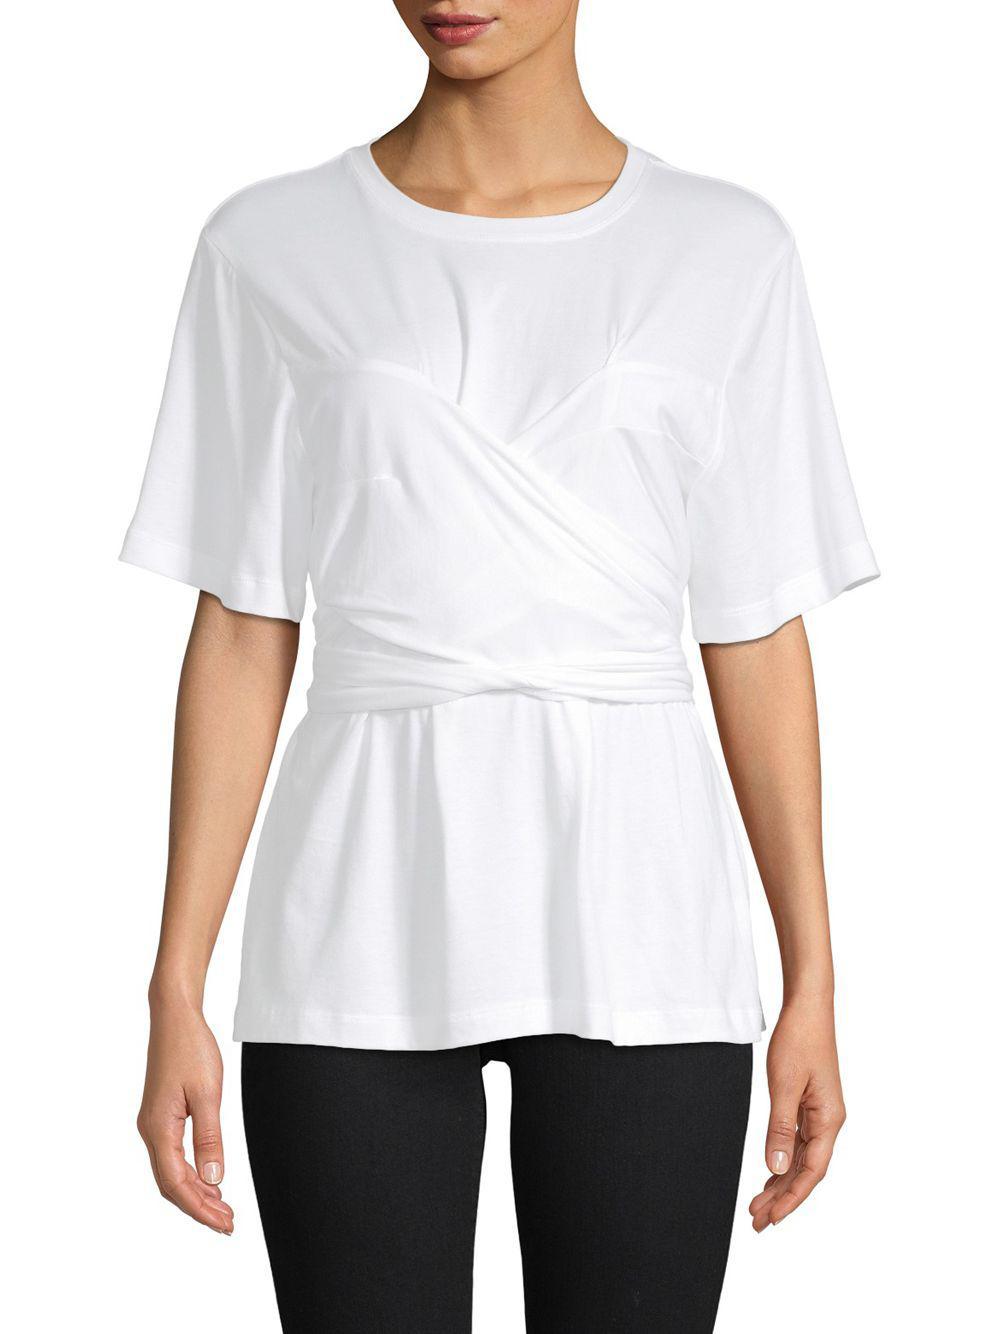 7a4083819e9f76 Lyst - Proenza Schouler Self-tie Cotton Top in White